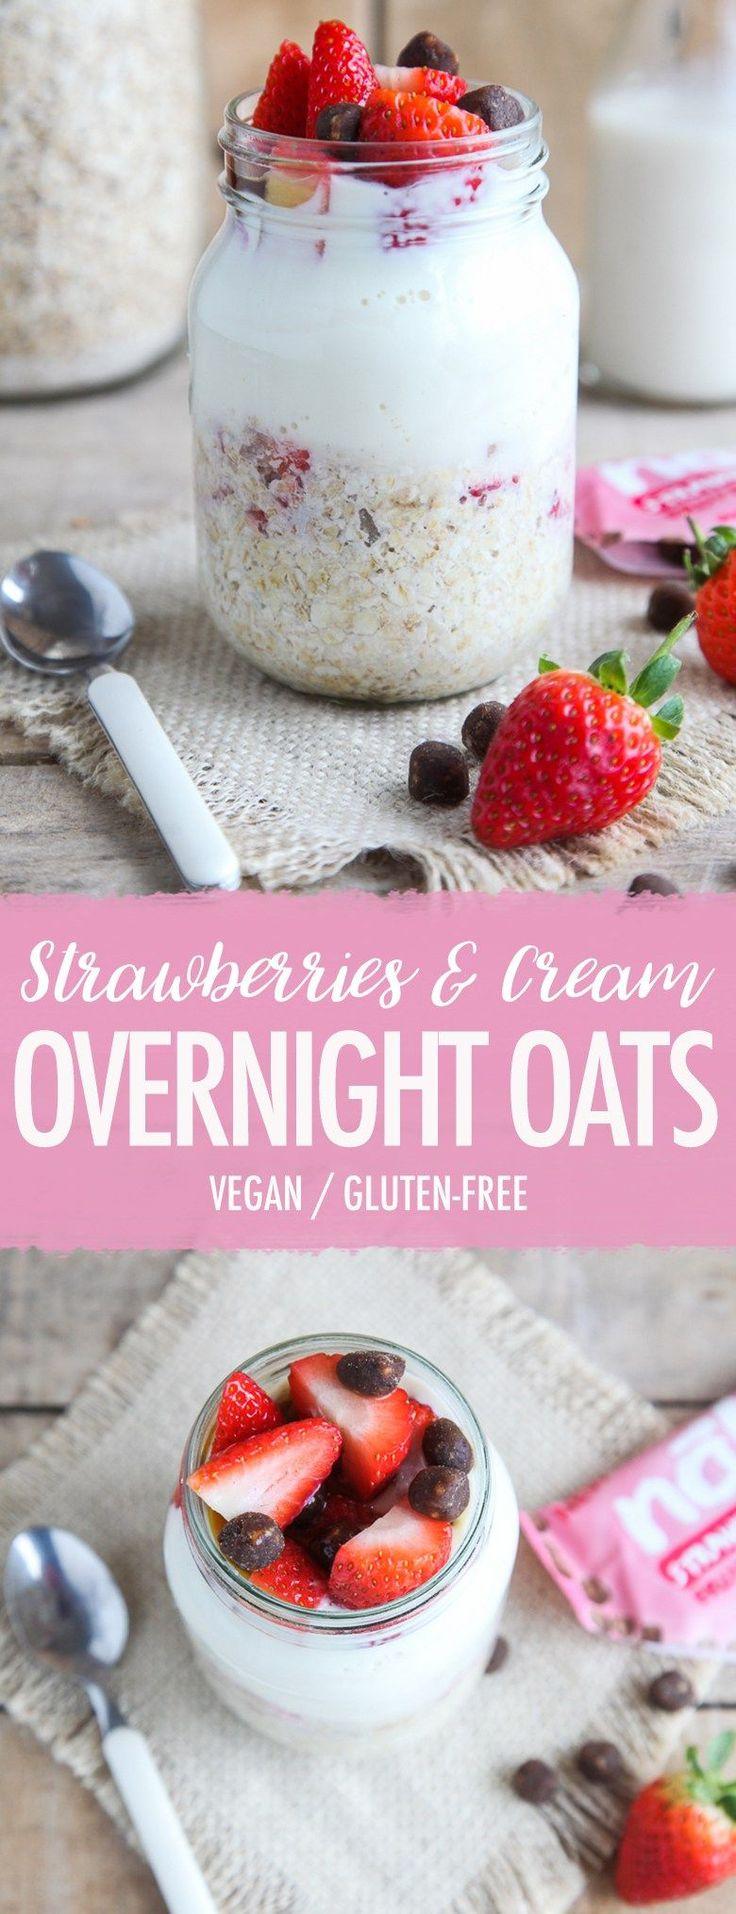 Strawberries Cream Overnight Oats (Vegan GF)